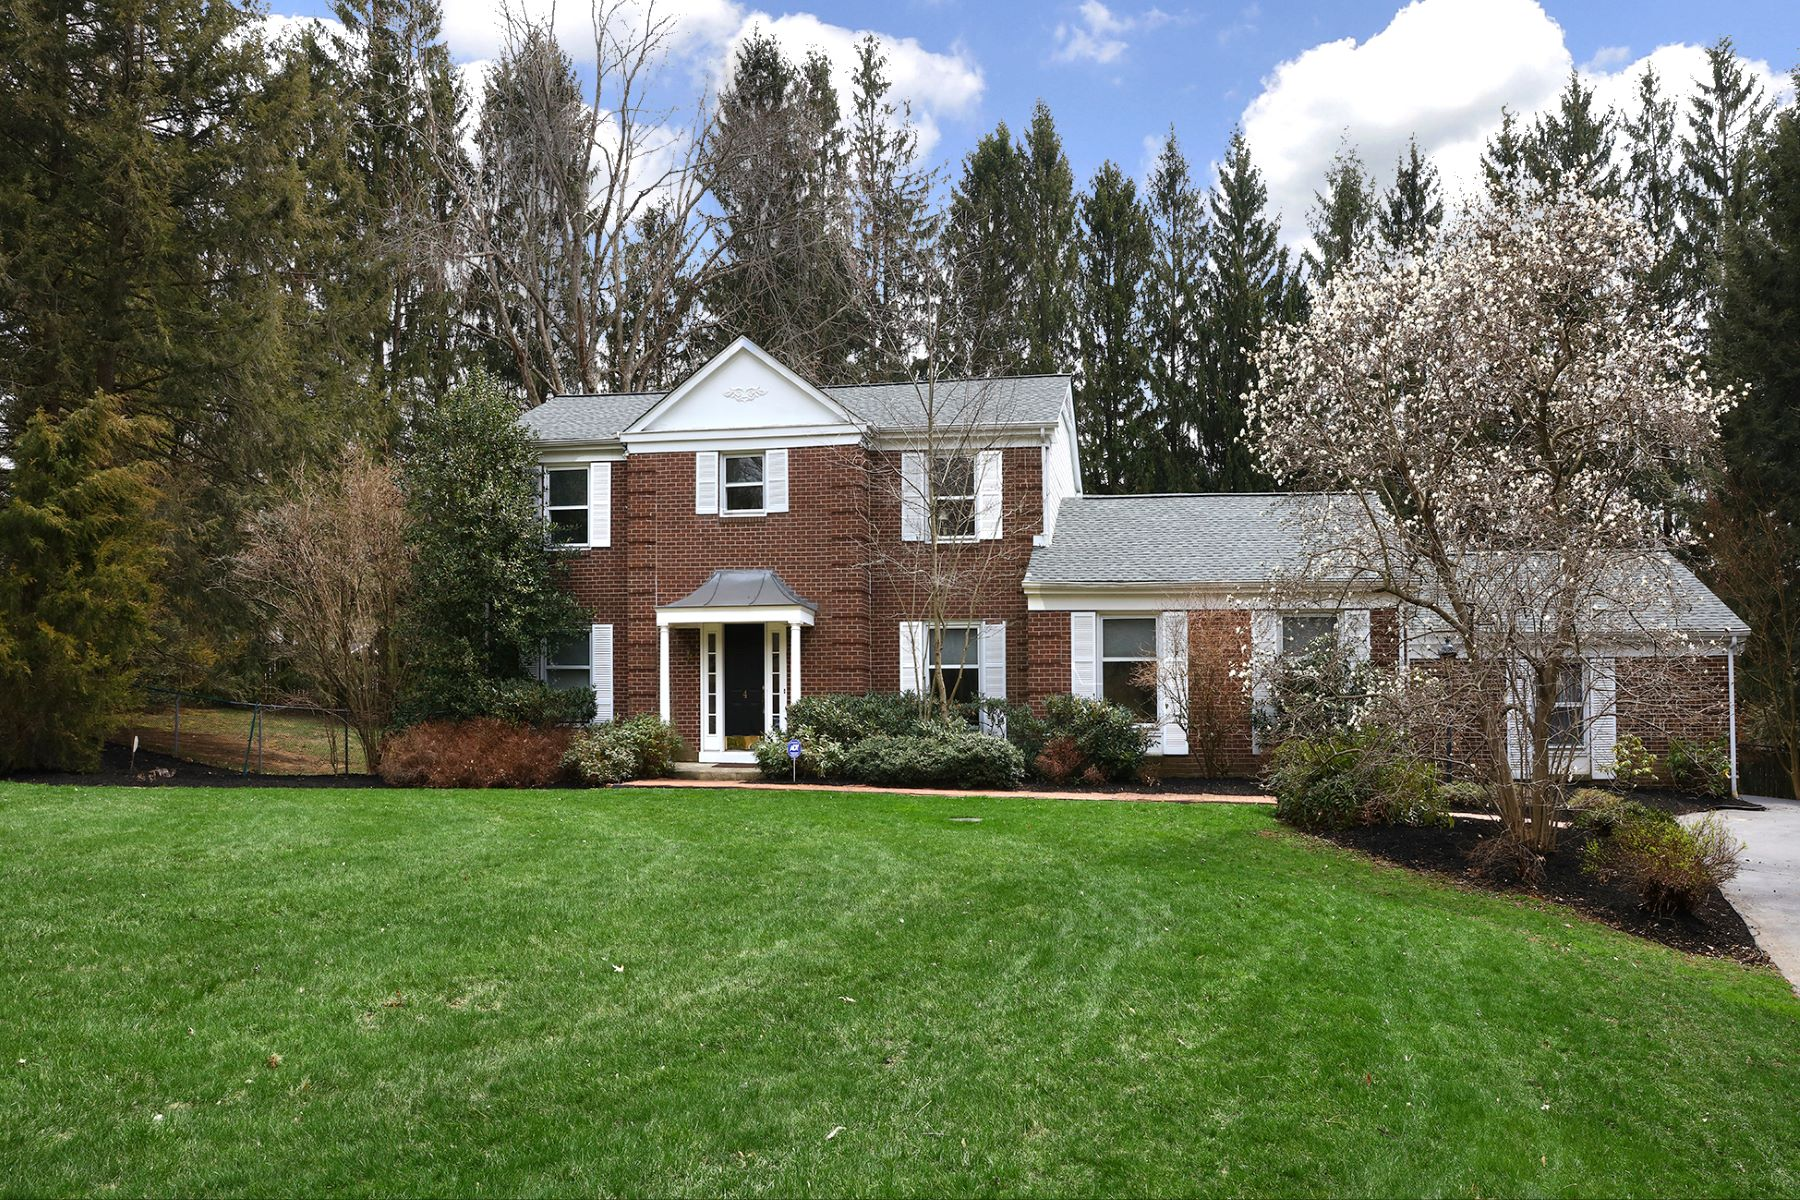 Casa Unifamiliar por un Venta en Renovated and Charming - Move Right In! 4 River Knoll Drive, Titusville, Nueva Jersey 08560 Estados UnidosEn/Alrededor: Hopewell Township